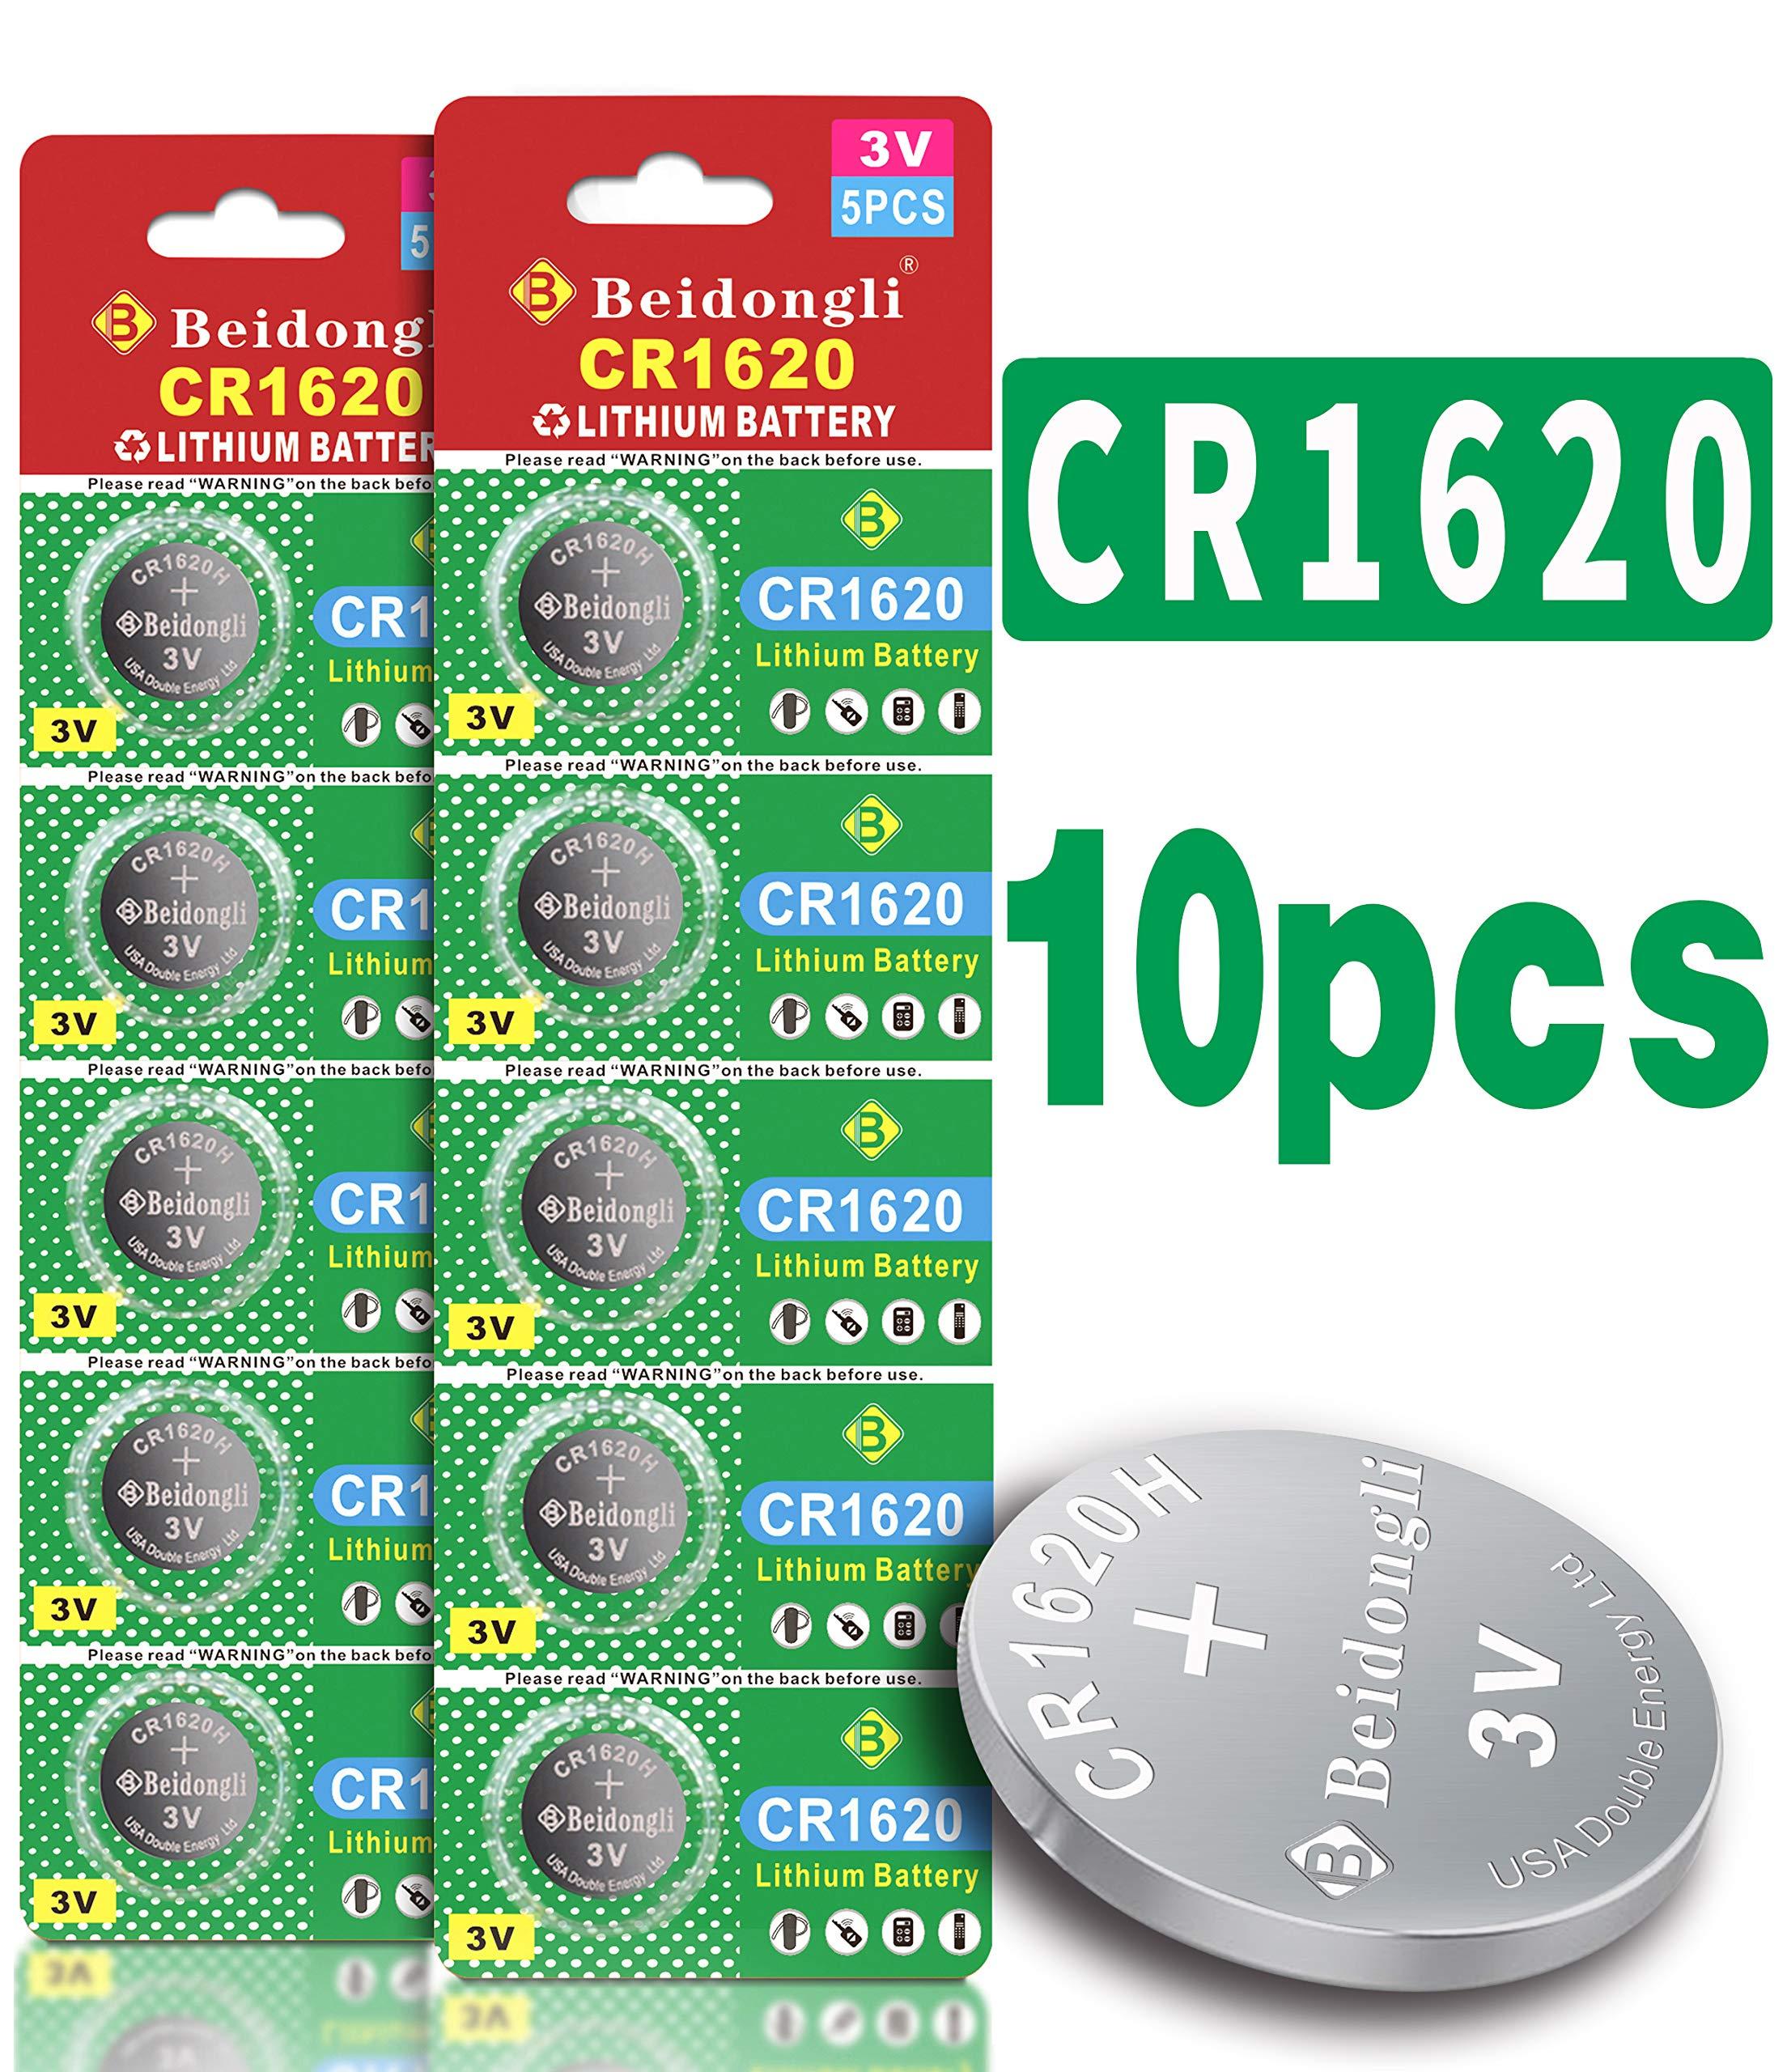 Beidongli CR1620 3 Volt High Capacity Lithium Coin Battery (10 Batteries)